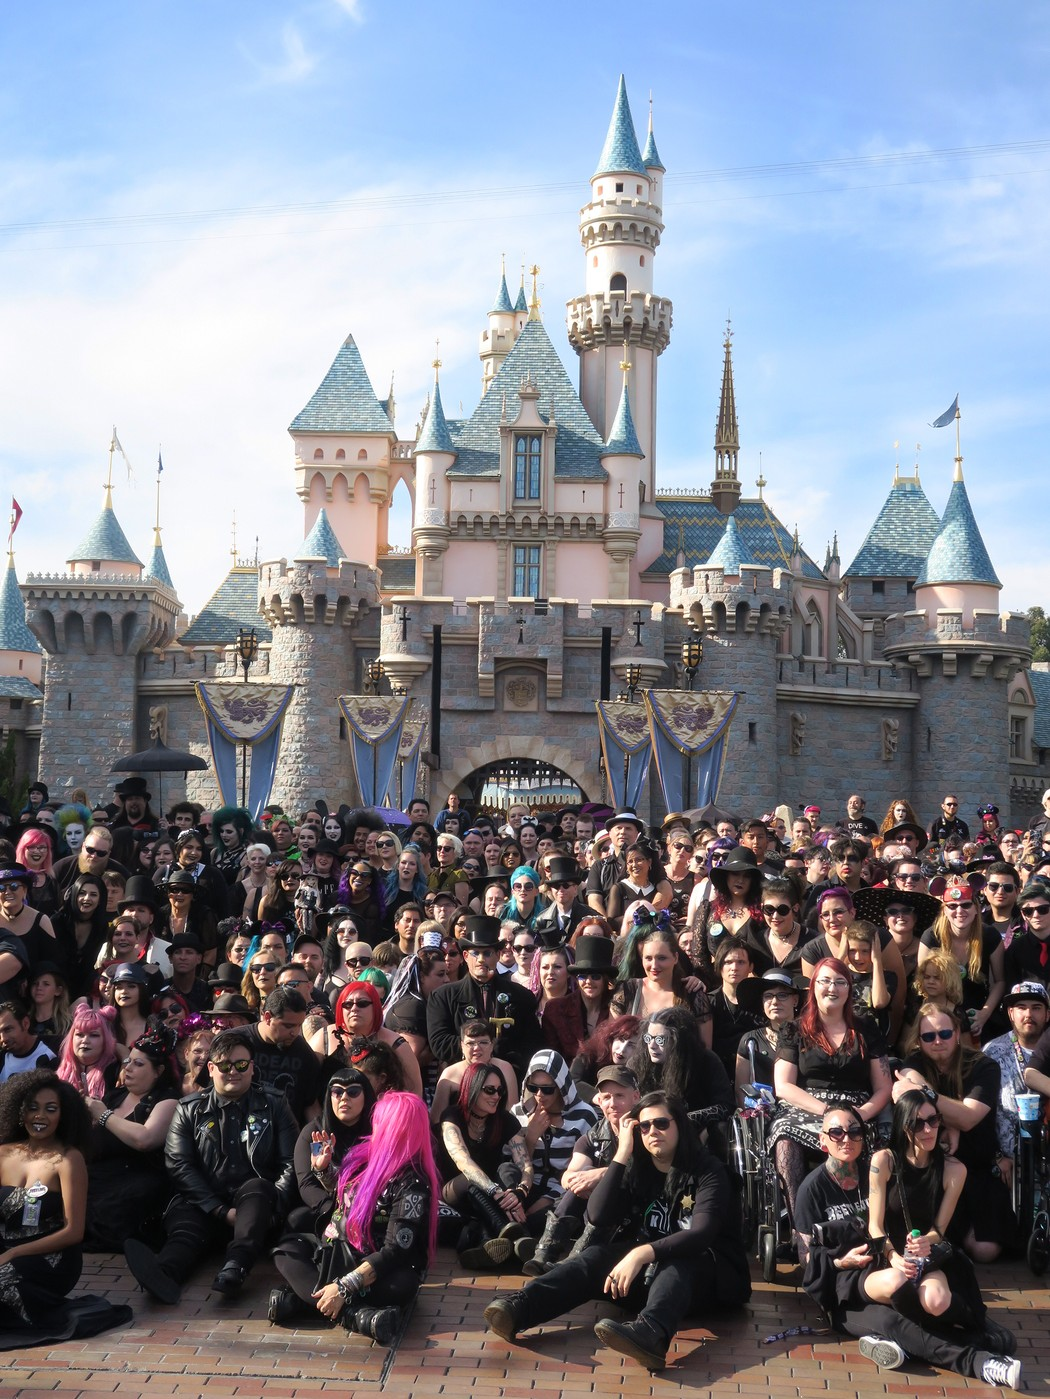 [Disneyland Resort] Le coin des petites infos - Page 7 1525729062489-Disneyland-Goth-Day-Sleeping-Beautys-Castle